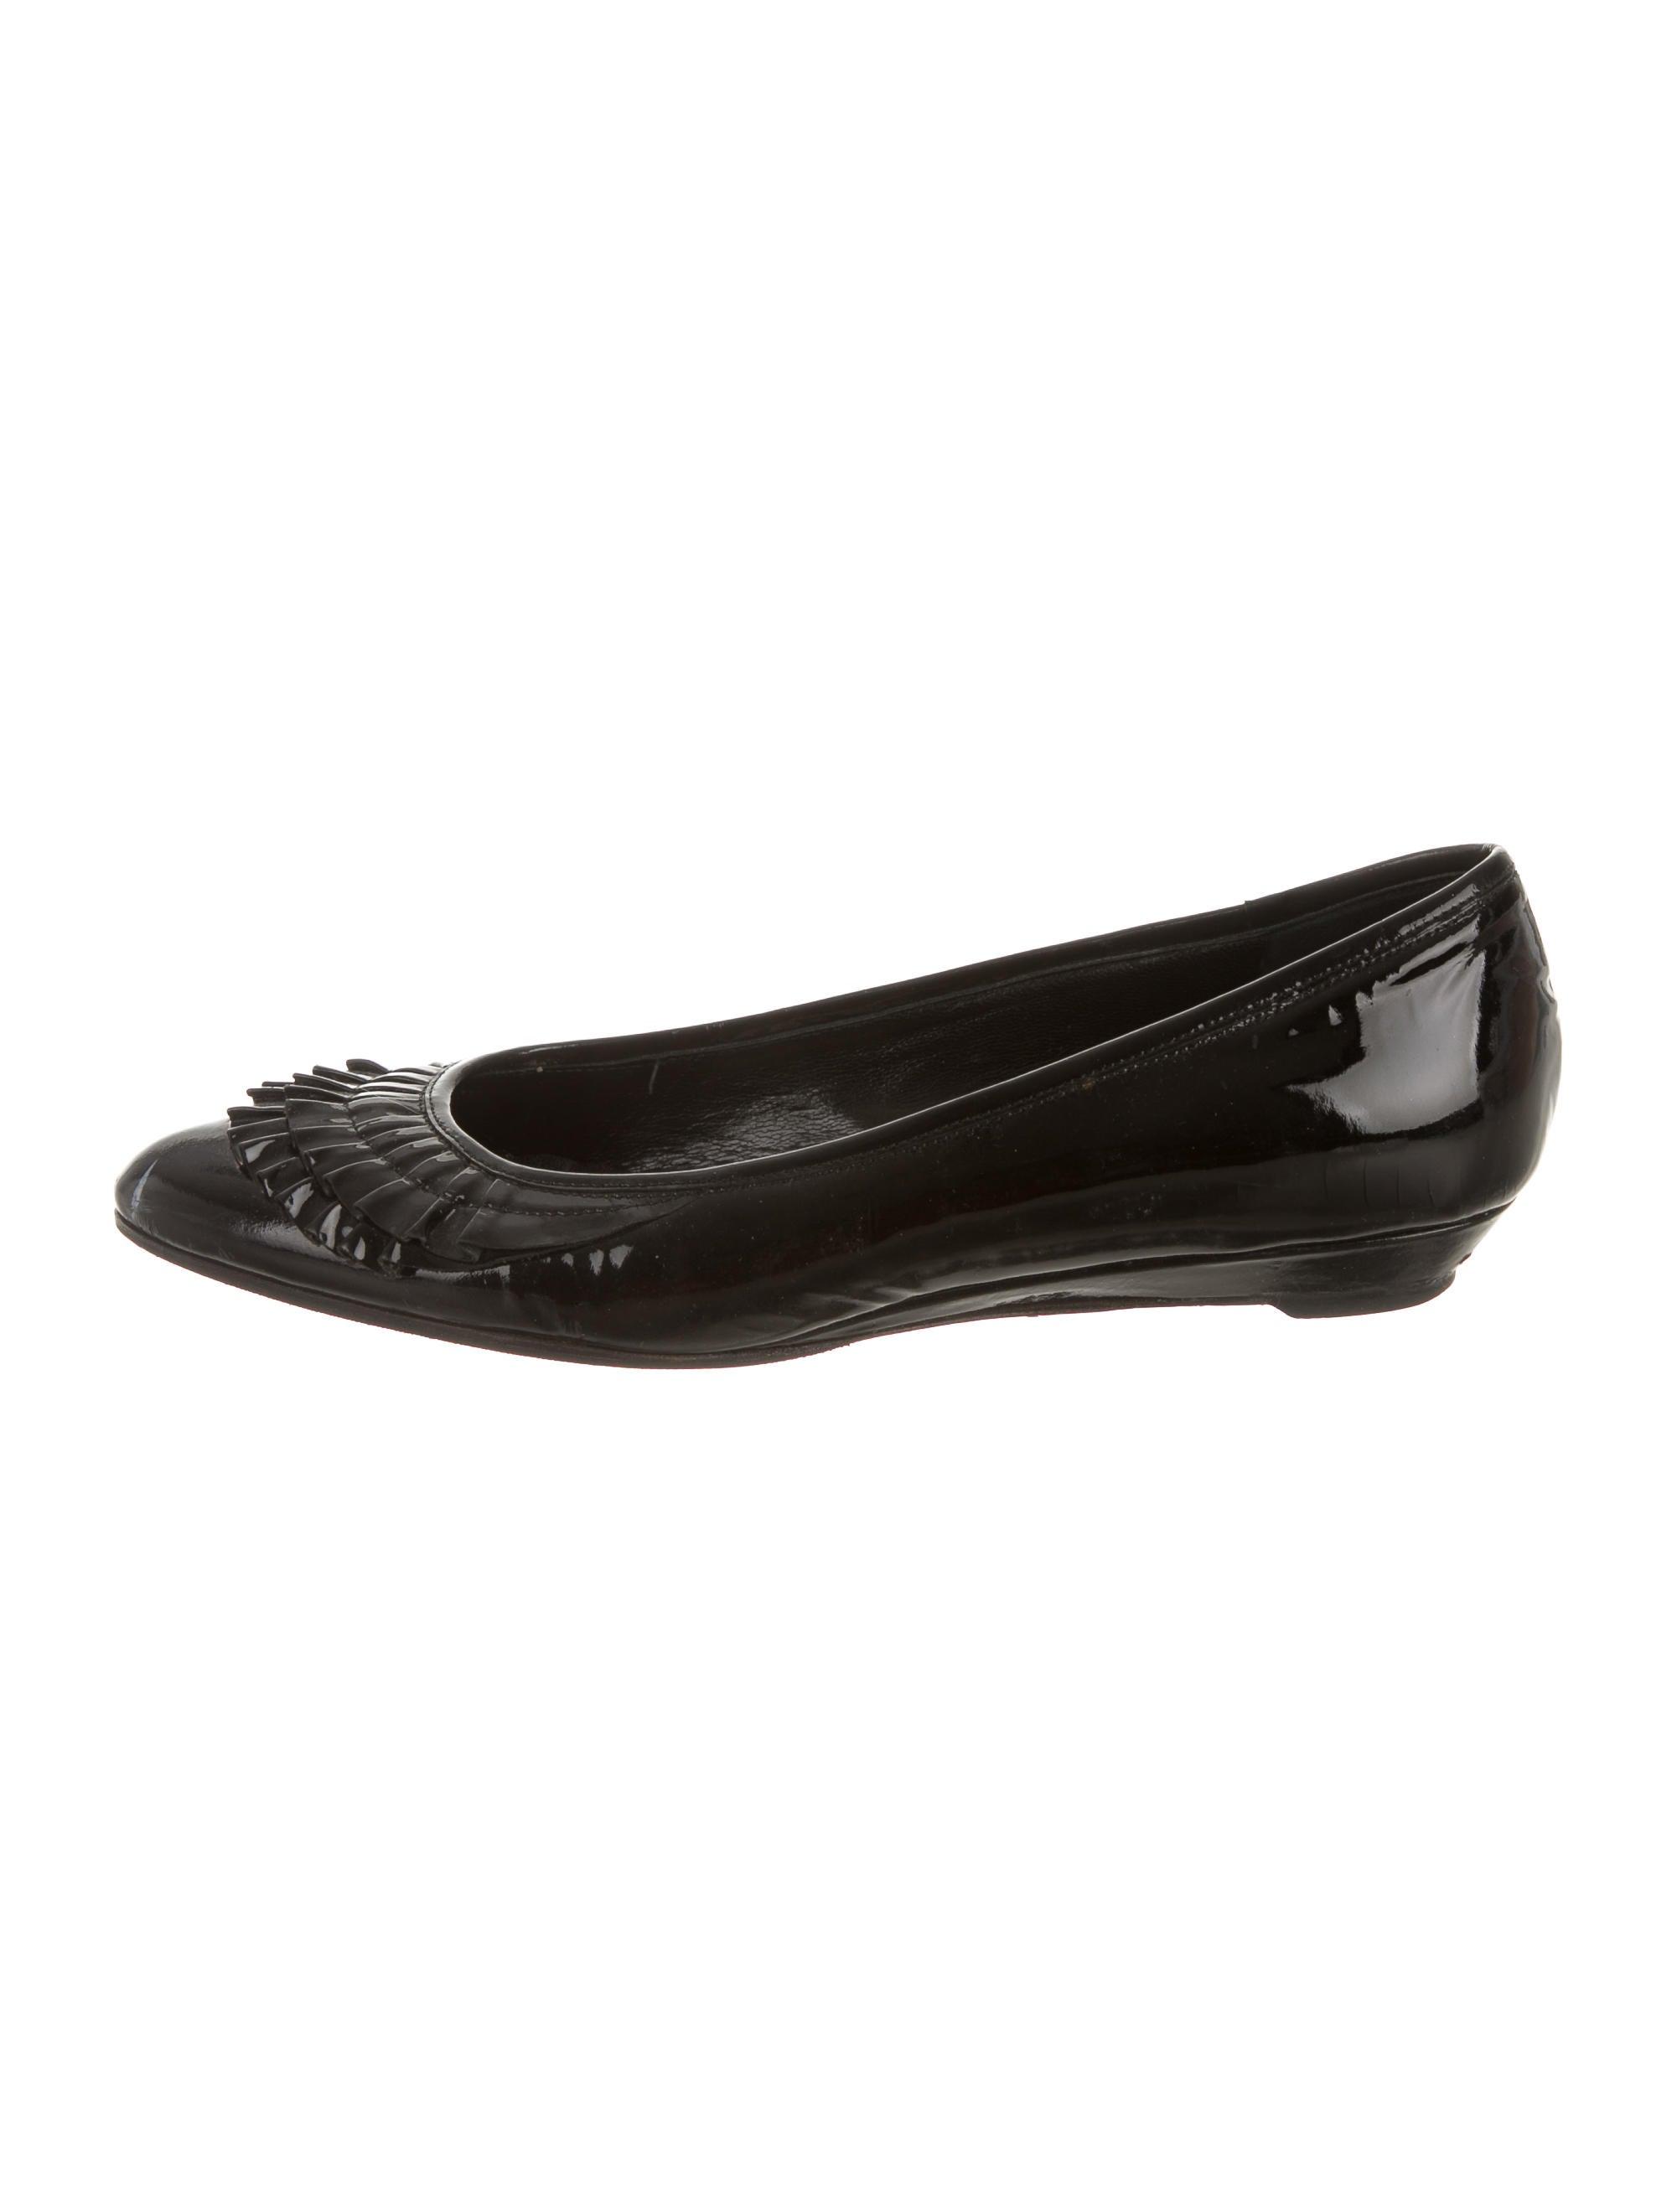 loeffler randall patent leather flats shoes wlf24295